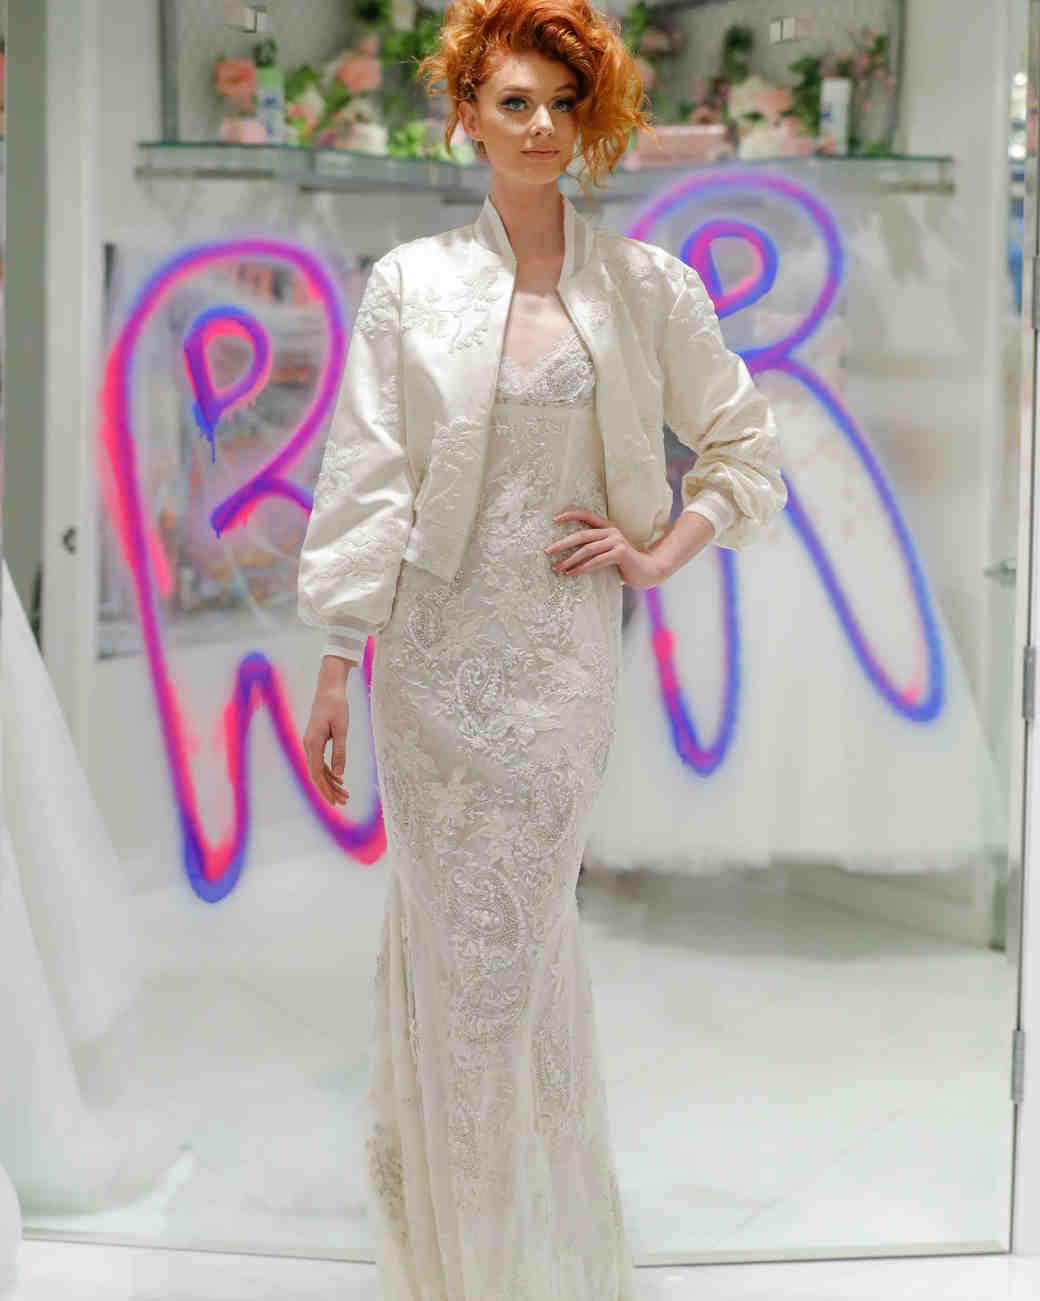 randi rahm fall 2019 fall 2019 mermaid v neck spaghetti strap beaded floral applique with bomber jacket